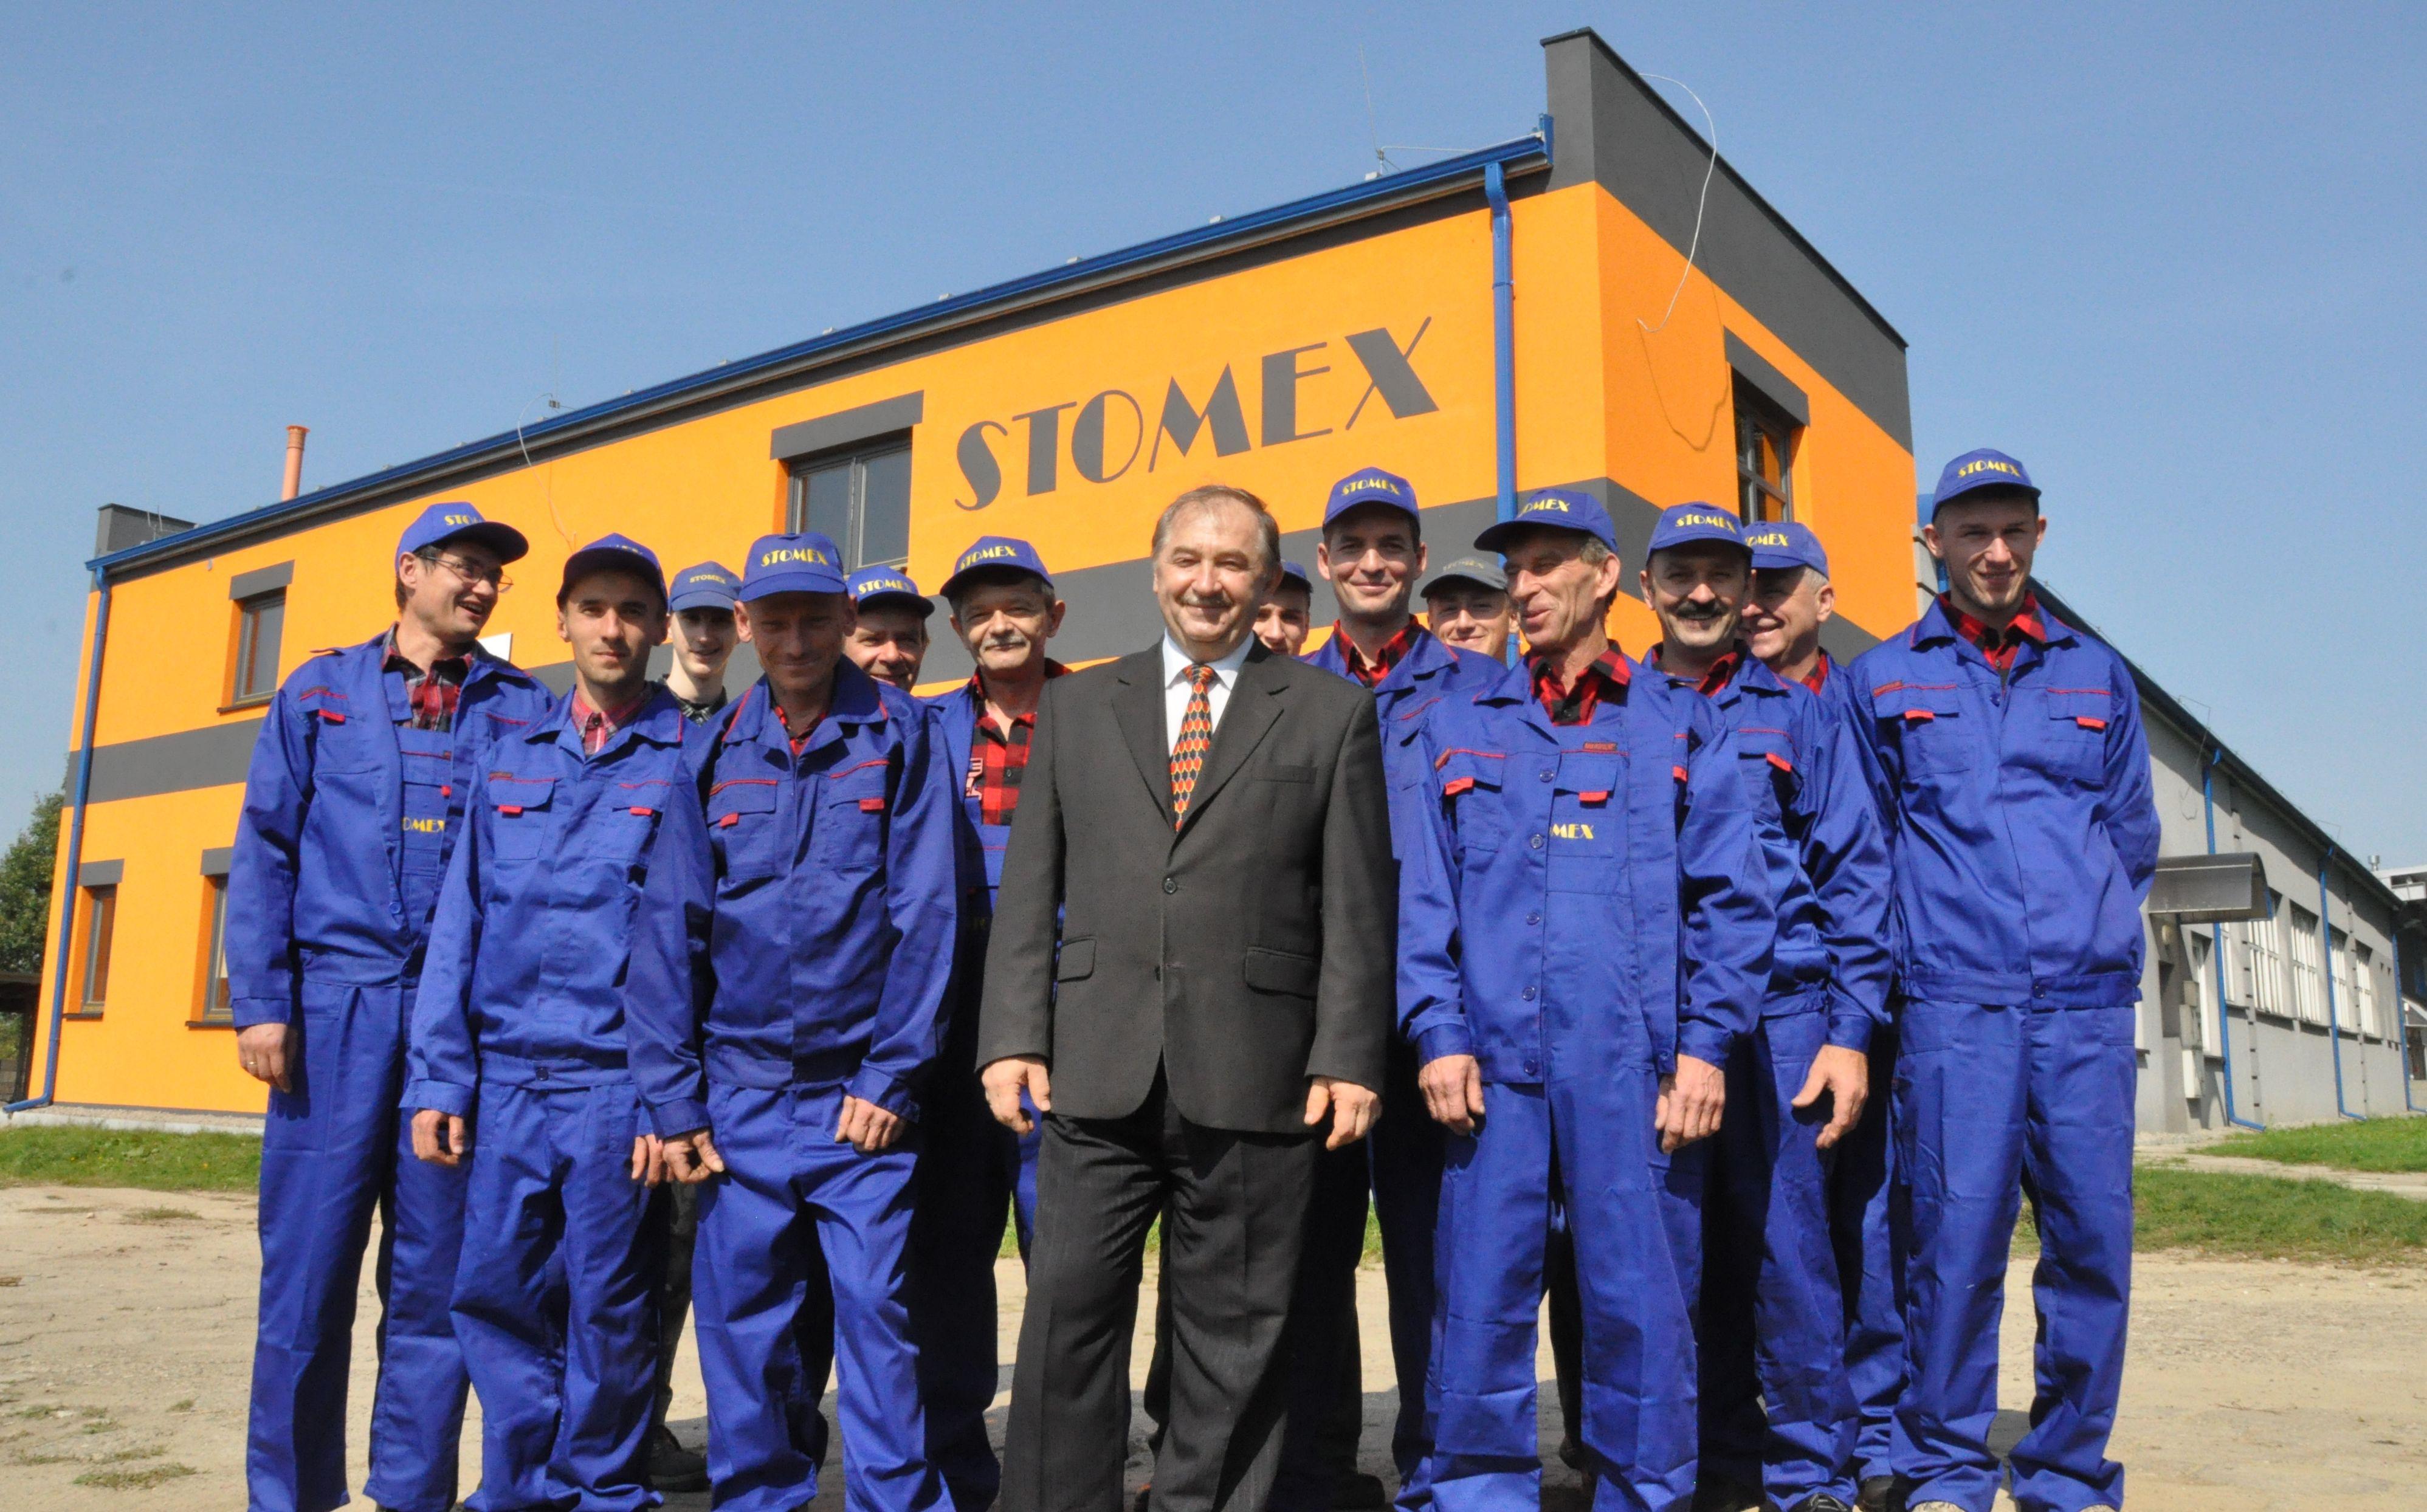 STOMEX-team